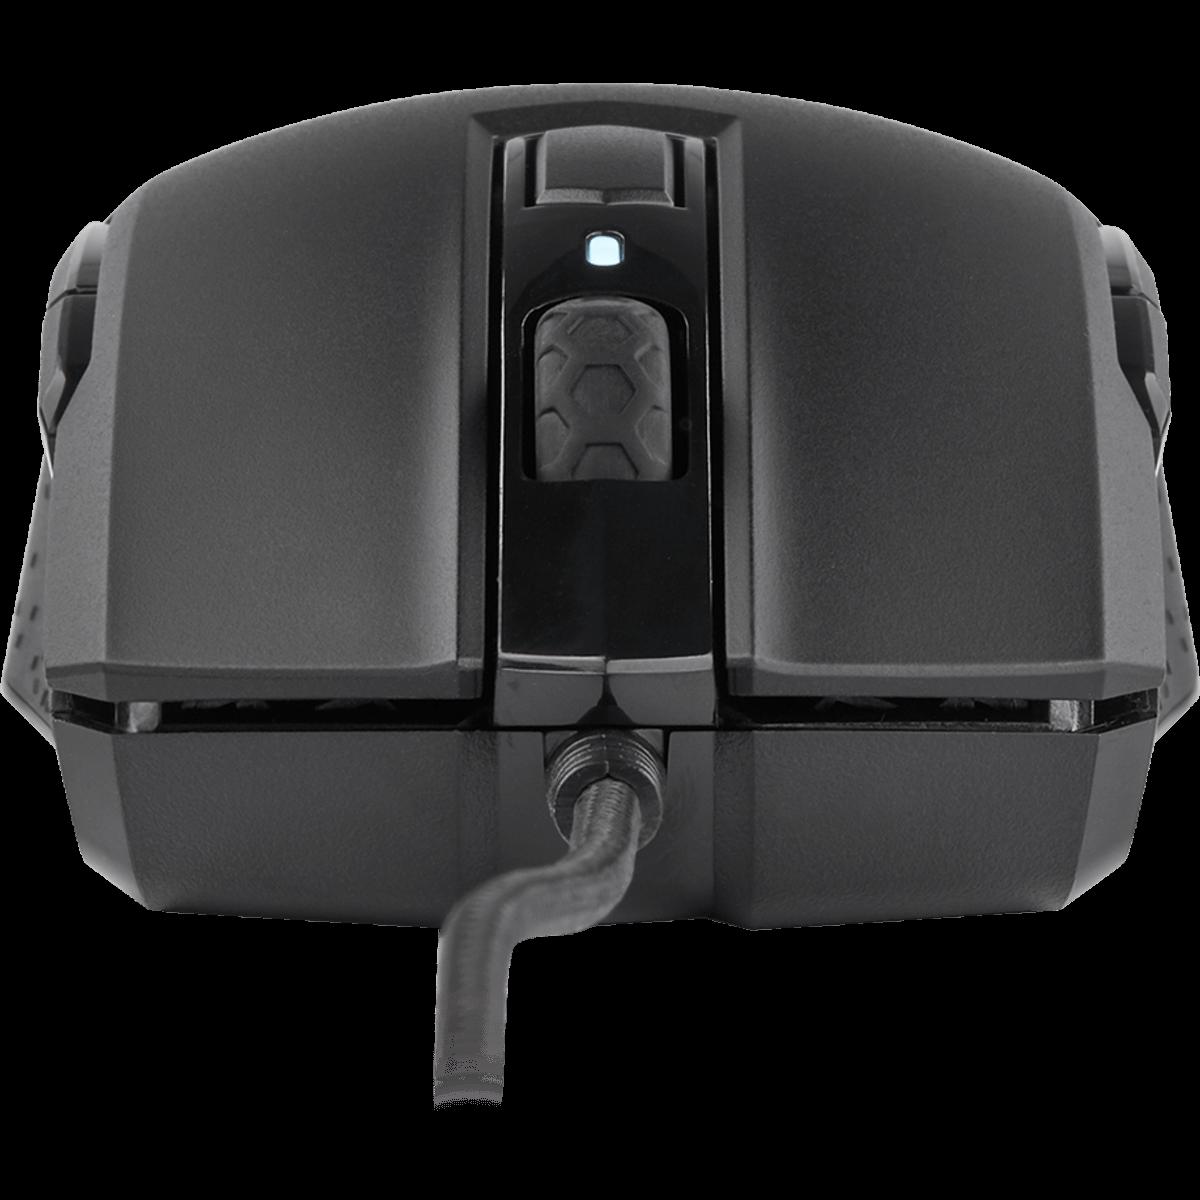 Mouse Gamer Corsair M55 RGB Pro, 12400DPI, Black, CH-9308011-NA